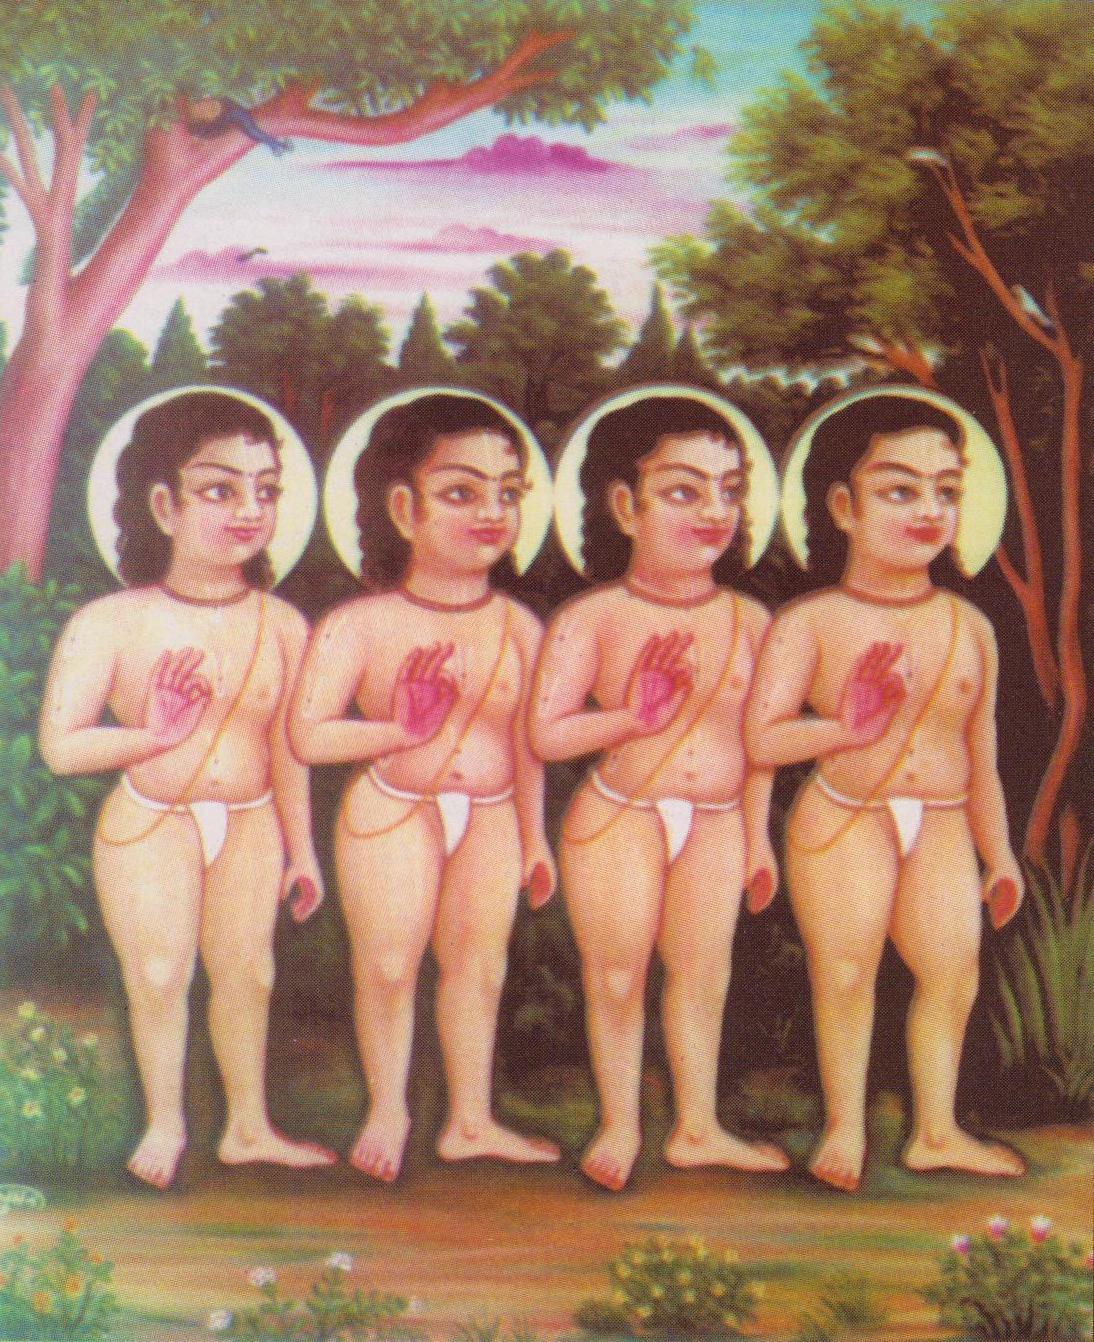 couretsy: http://upload.wikimedia.org/wikipedia/commons/f/fd/Sankadi_Muni_Bhagavan.jpg